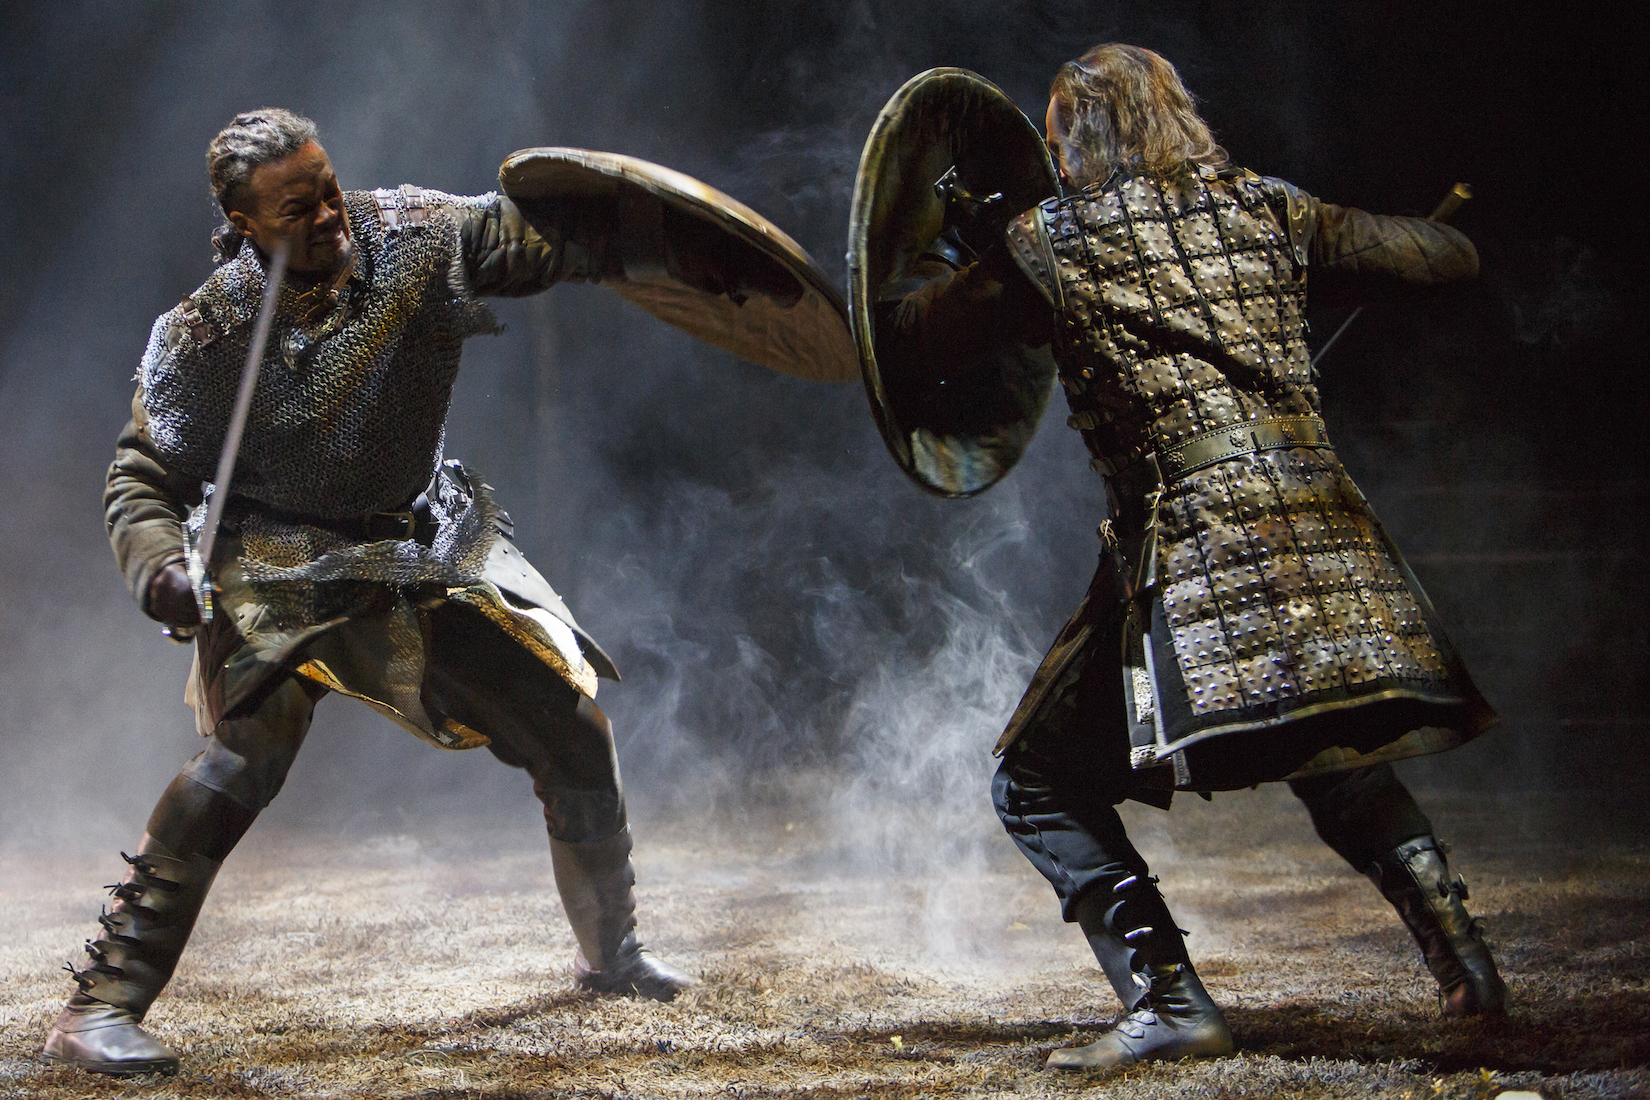 macbeth vs macduff Macduff turn, hellhound, turn macduff turn around, you dog from hell,  turn around macbeth of all men else i have avoided thee 5but get thee back.